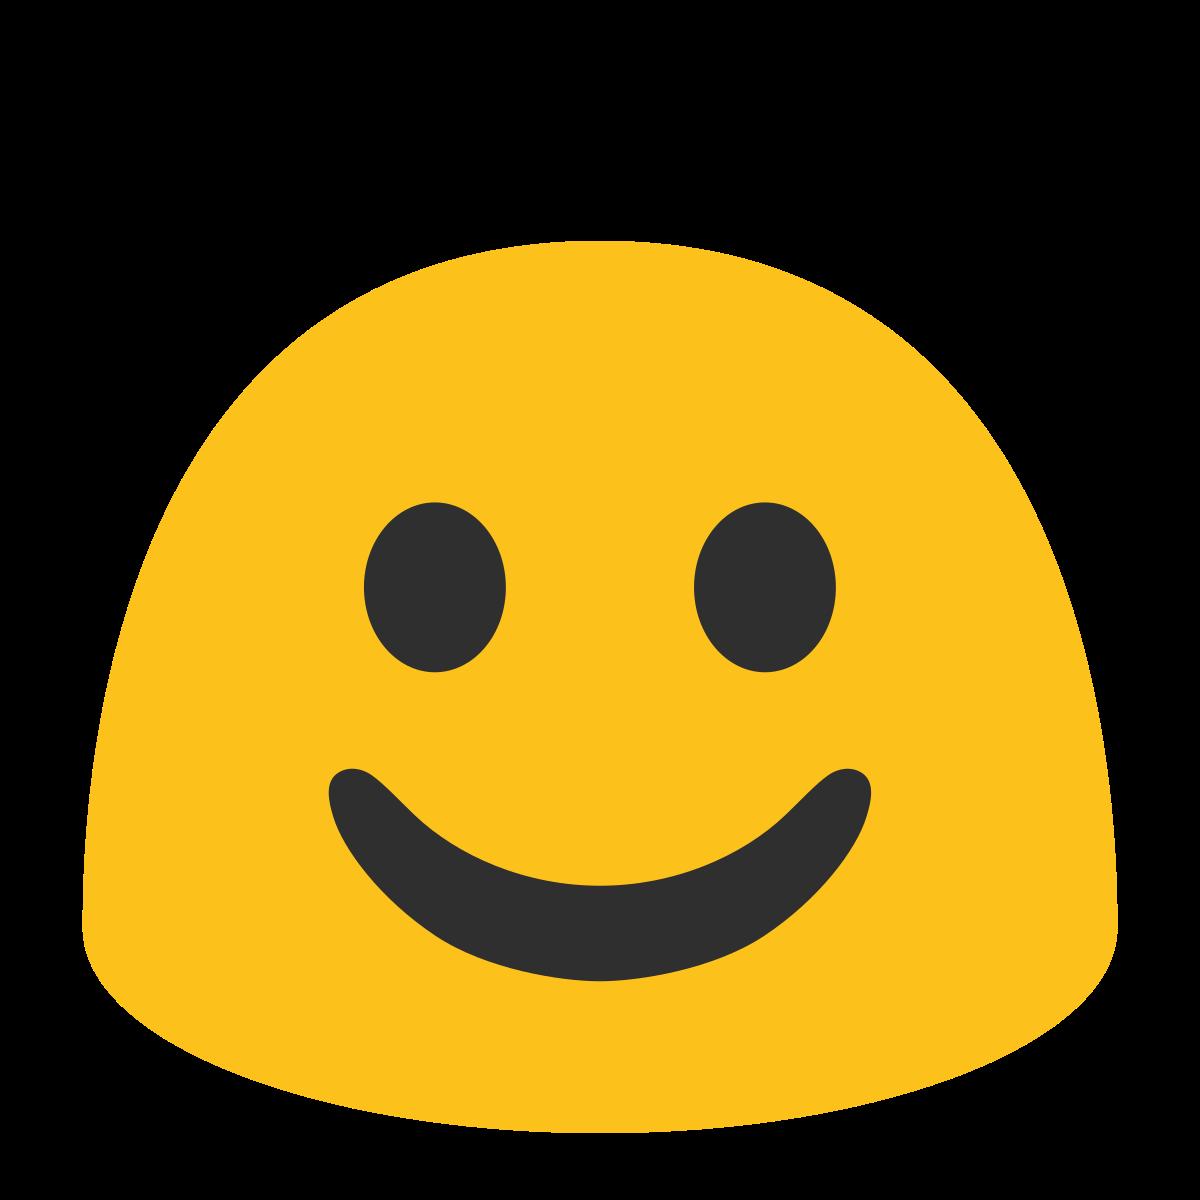 Money face emoji png. Wikipedia